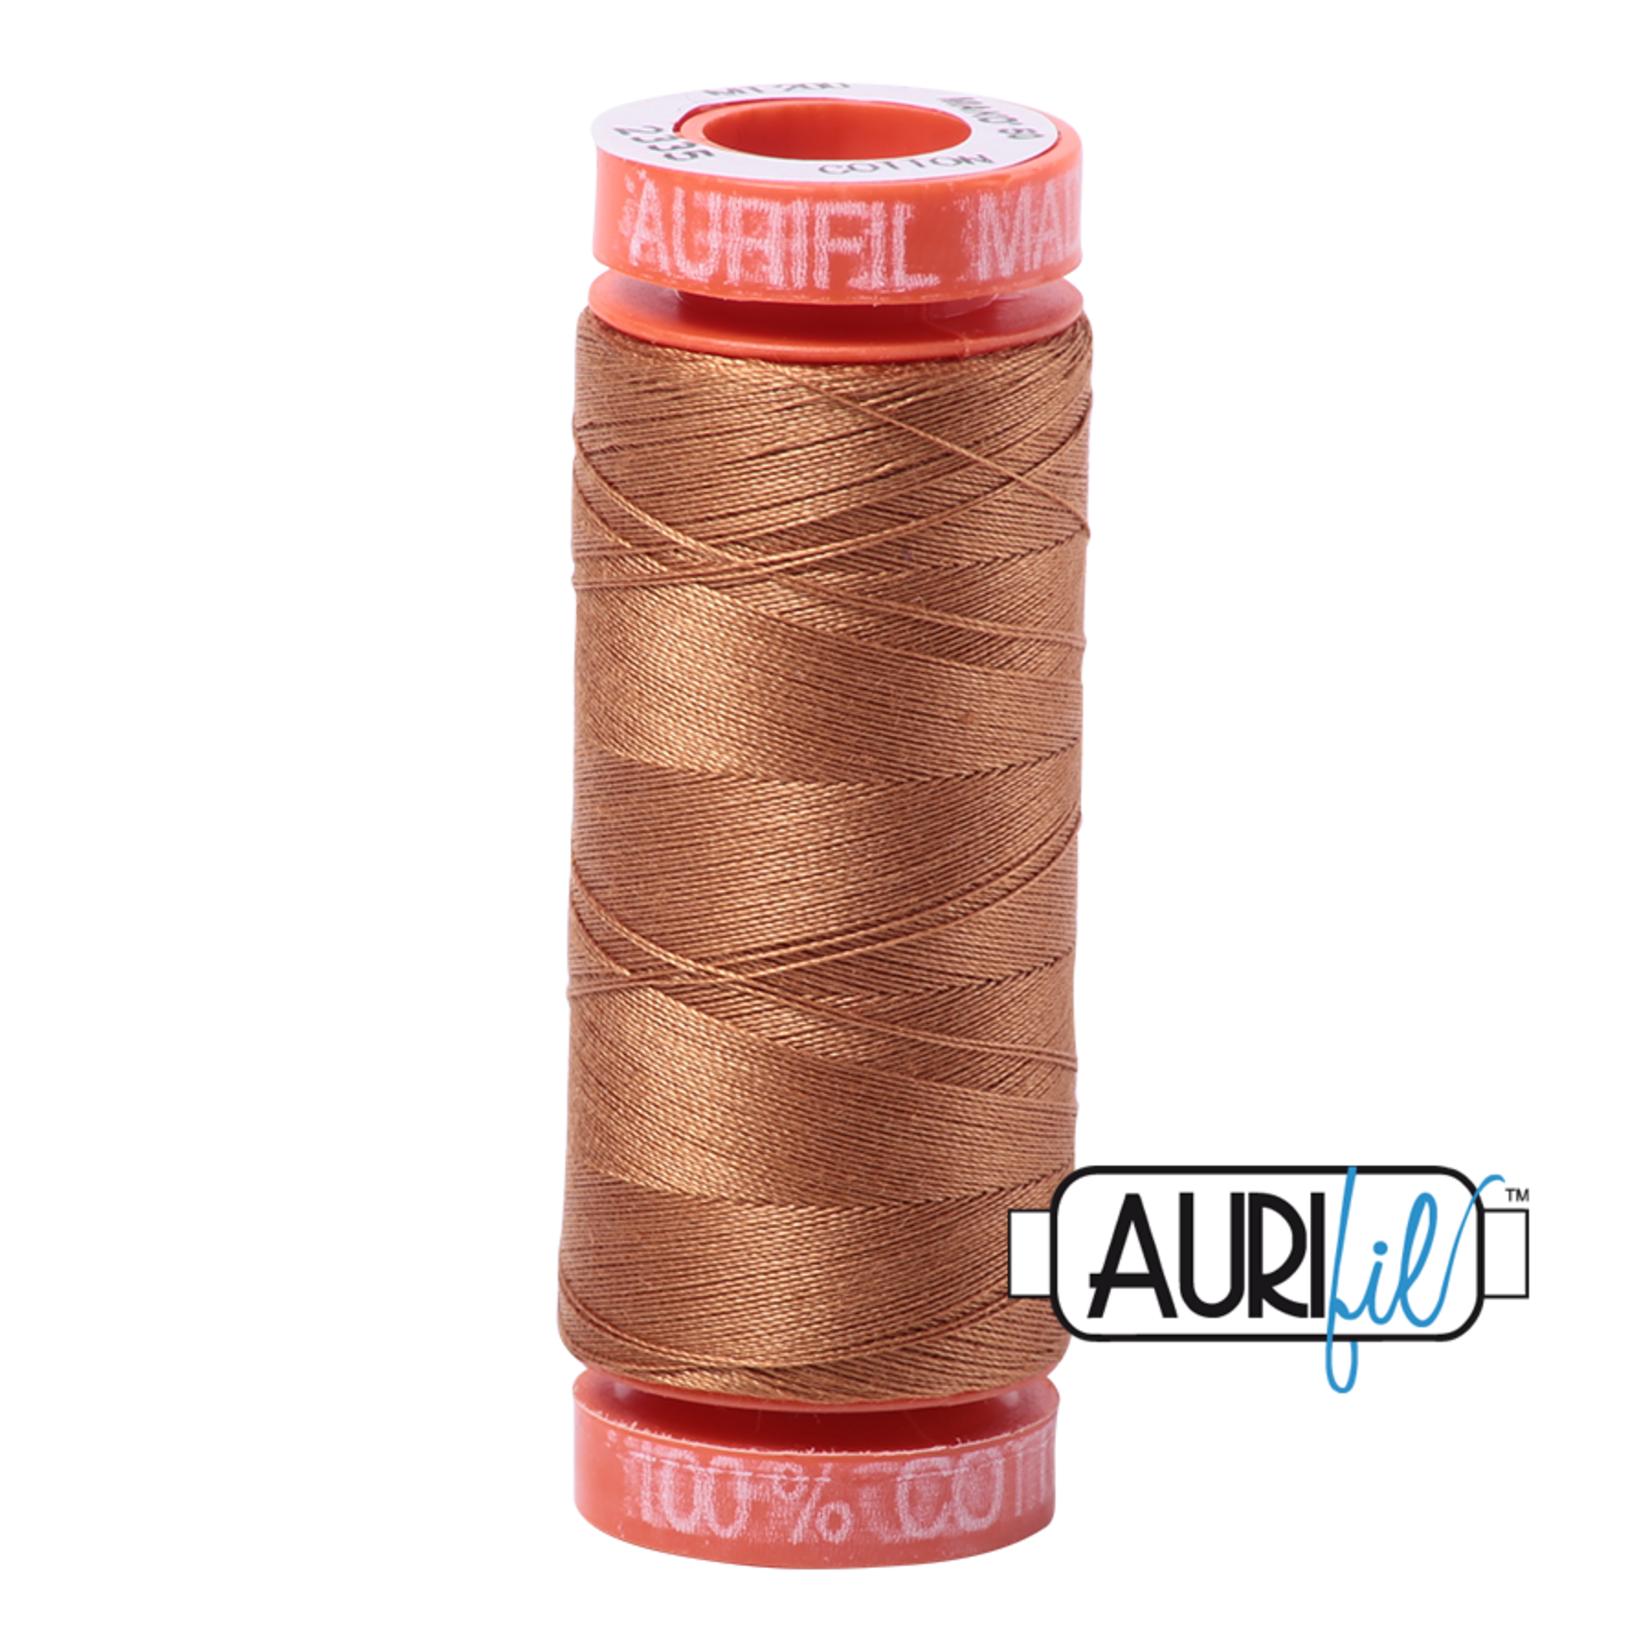 AURIFIL AURIFIL 50 WT Light Cinnamon 2335 Small Spool